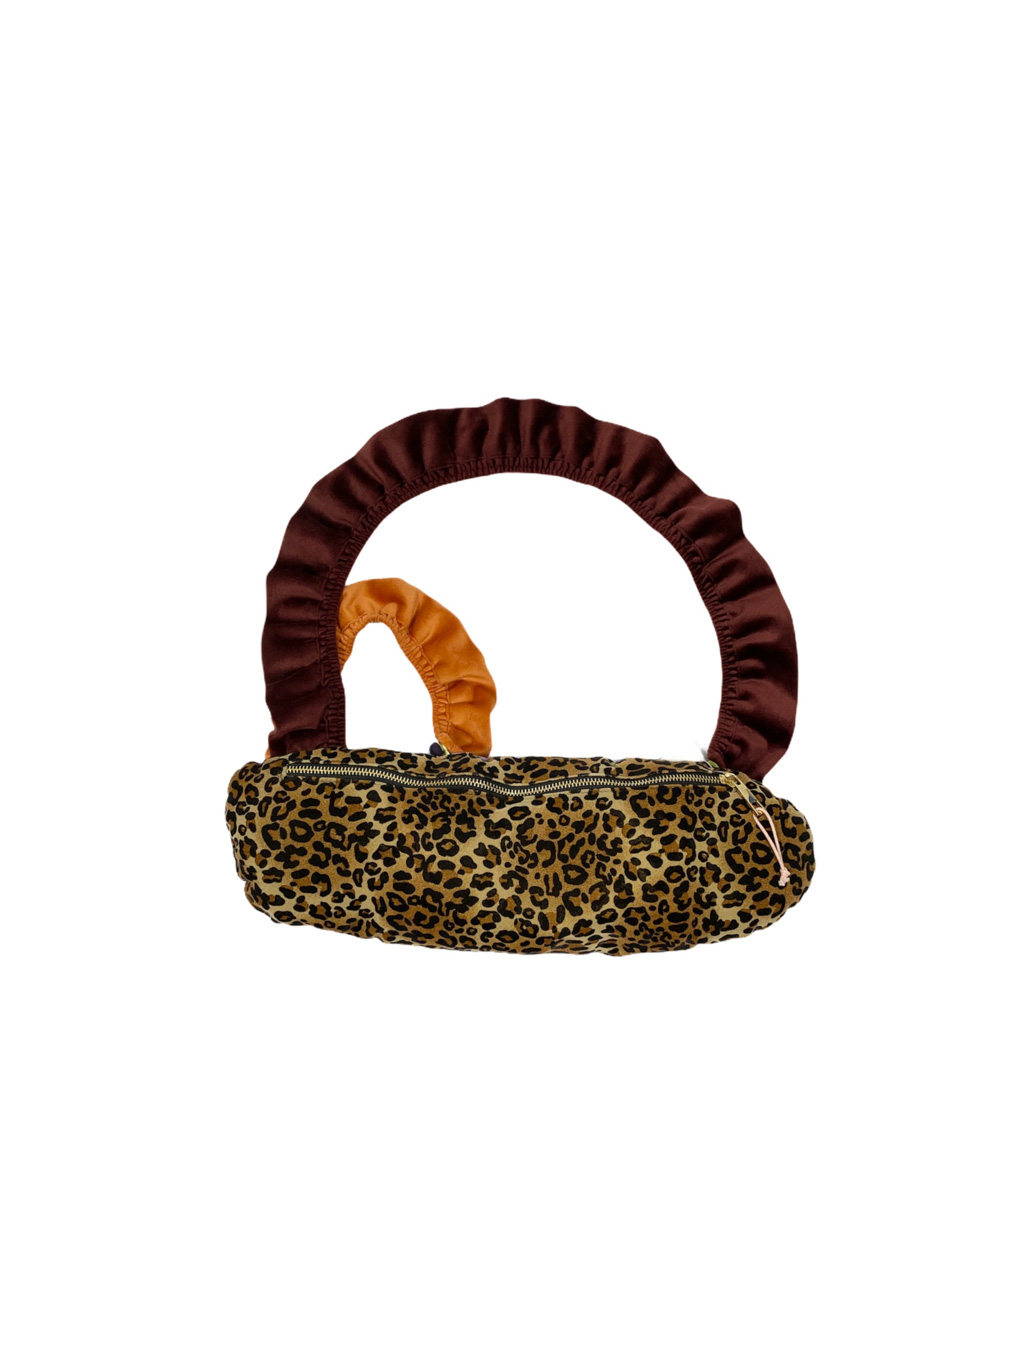 Elephent Rocket Kikkok pillow purse